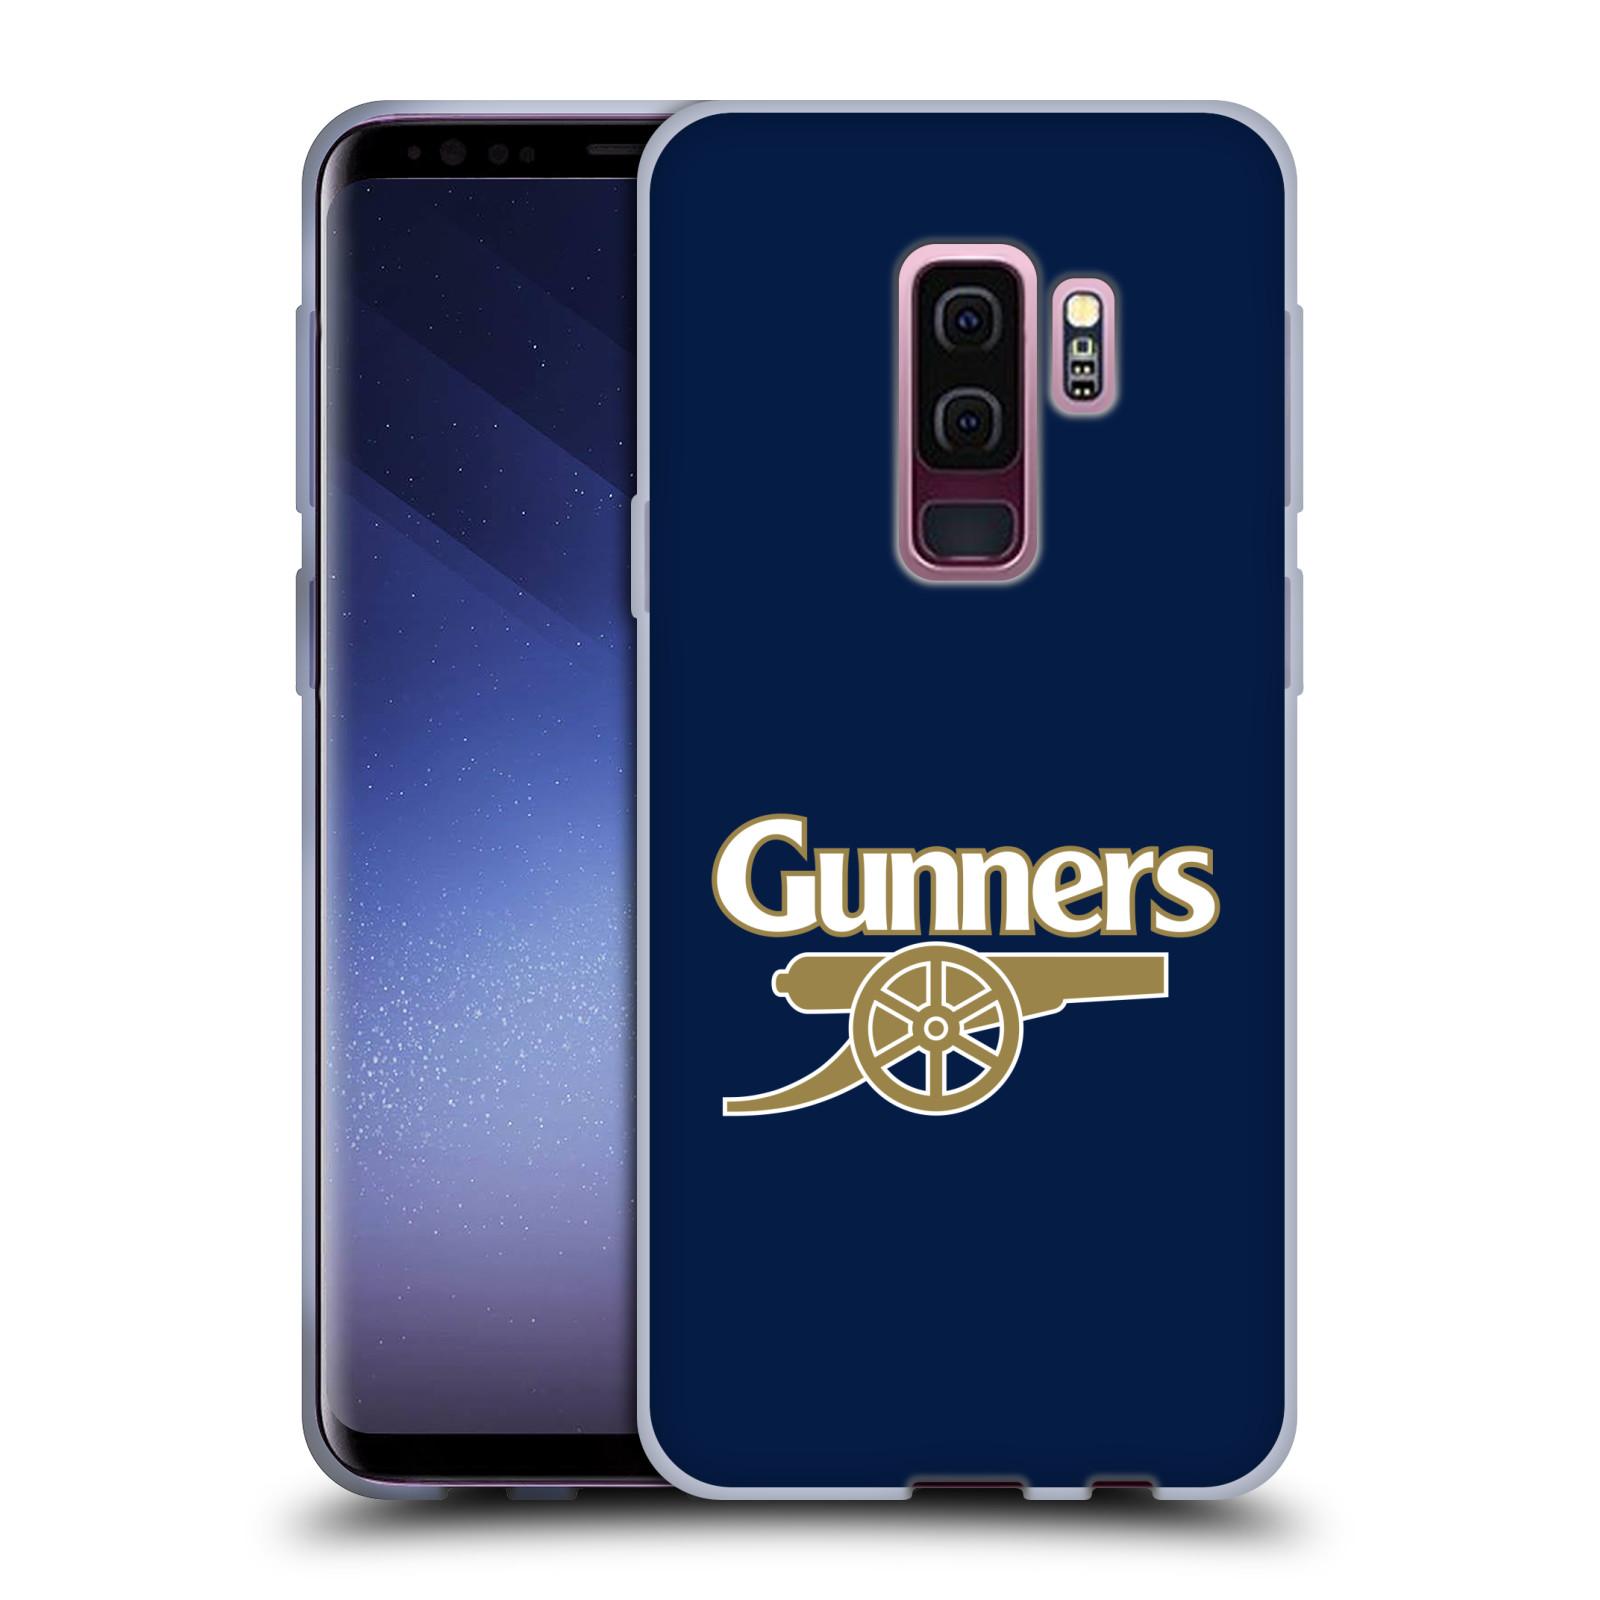 Silikonové pouzdro na mobil Samsung Galaxy S9 Plus - Head Case - Arsenal FC - Gunners